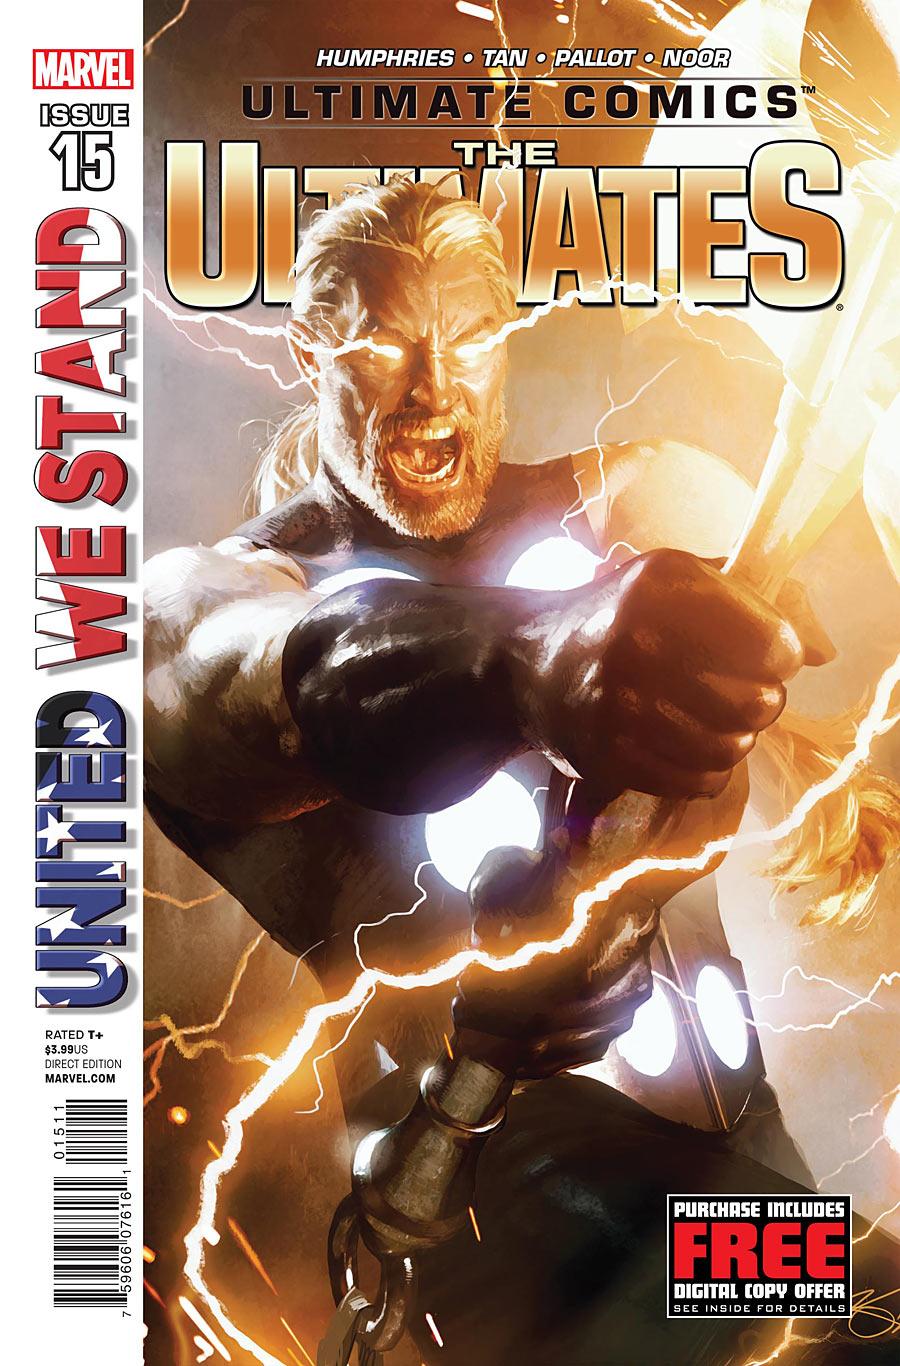 Leer The Ultimates Volumen 1, 2, 3 y 4 Online en Español